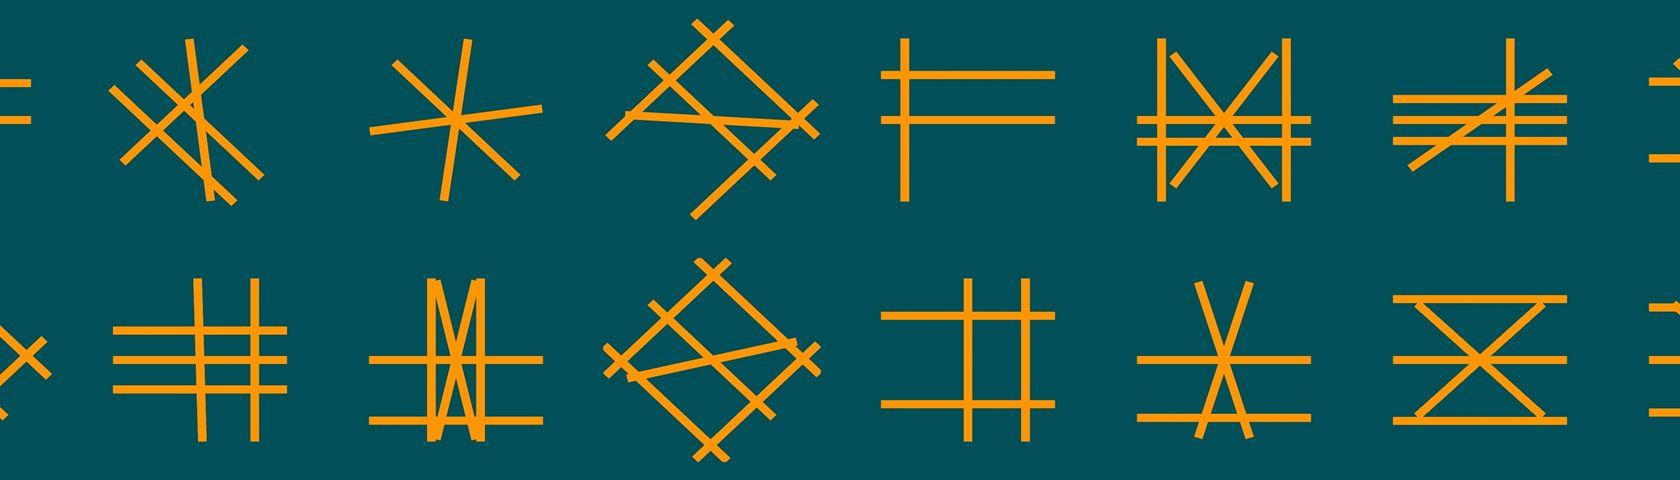 Semik Alphabet